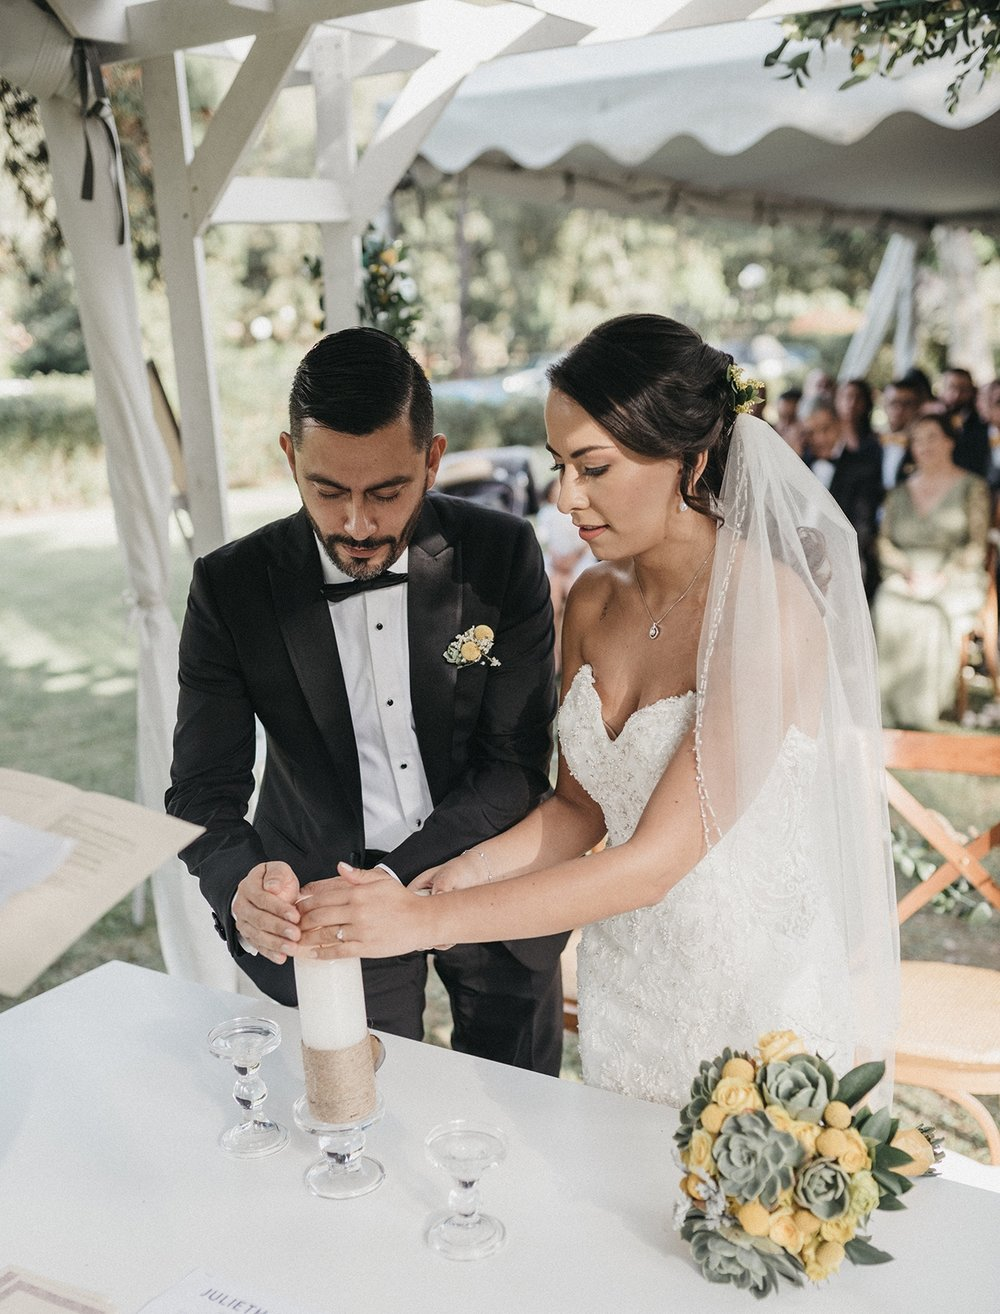 julieth-bravo-ceremonia-luz-simbolica-matrimonio-airelibre-boda-destino-wedding-planner-bogota.jpg